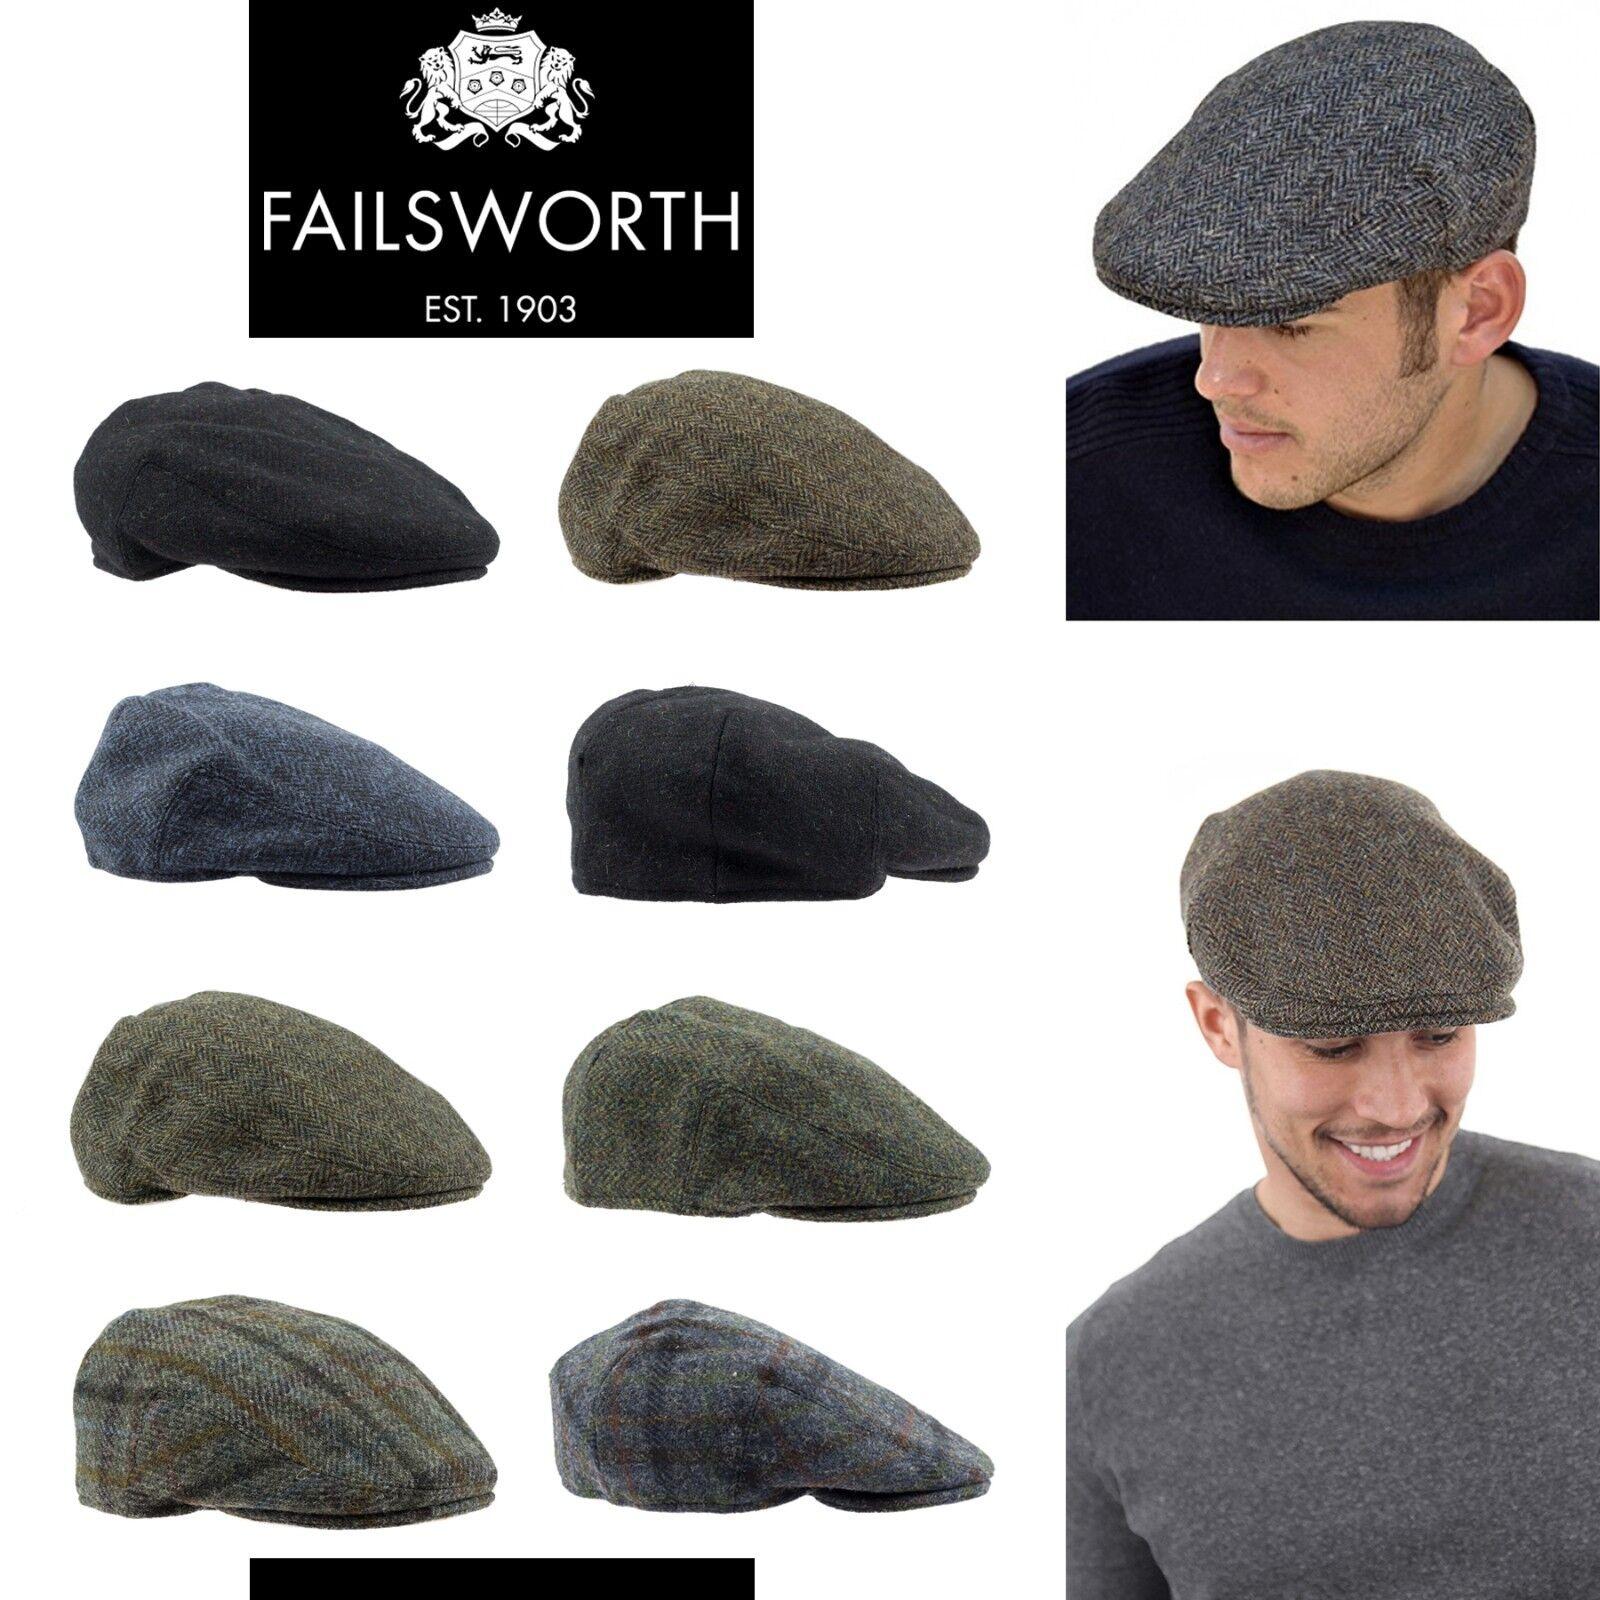 Failsworth Donegal Windsor Magee Irish Tweed Laine Flat Cap